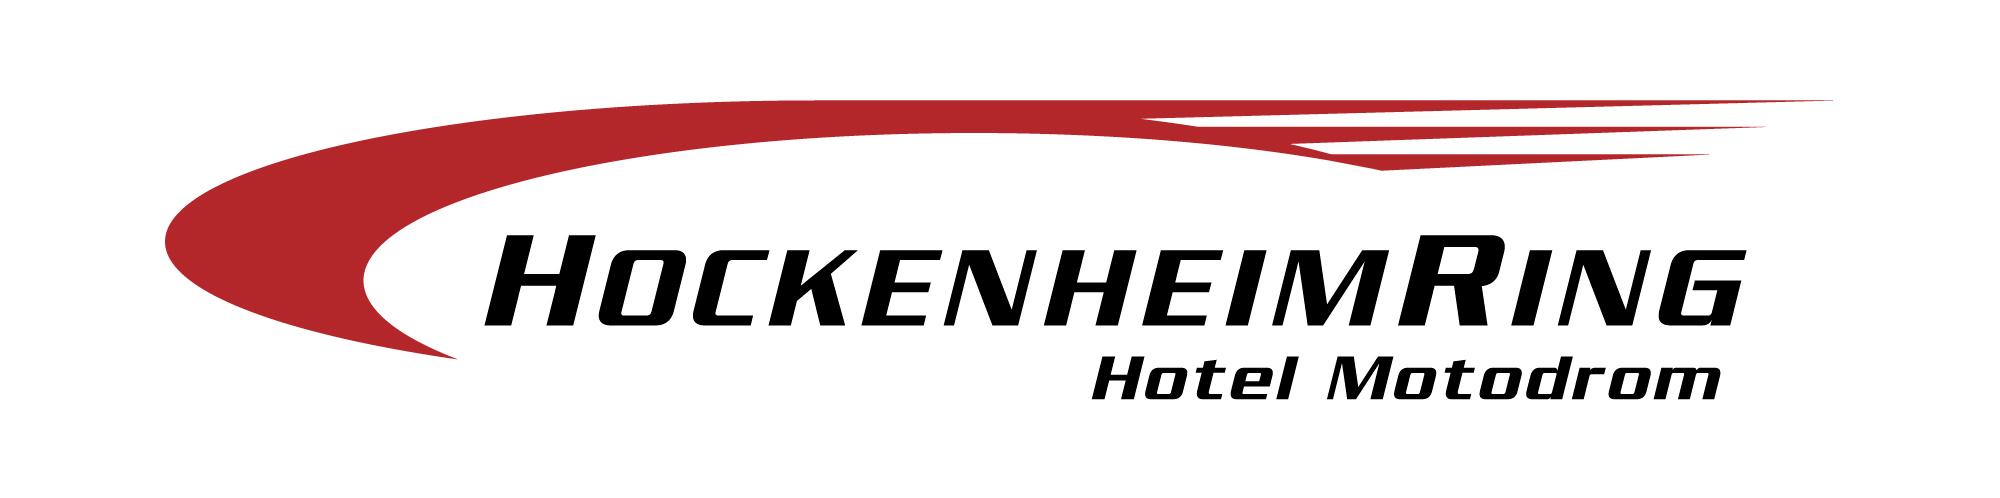 Logo Hockenheimring Hotel Motodrom